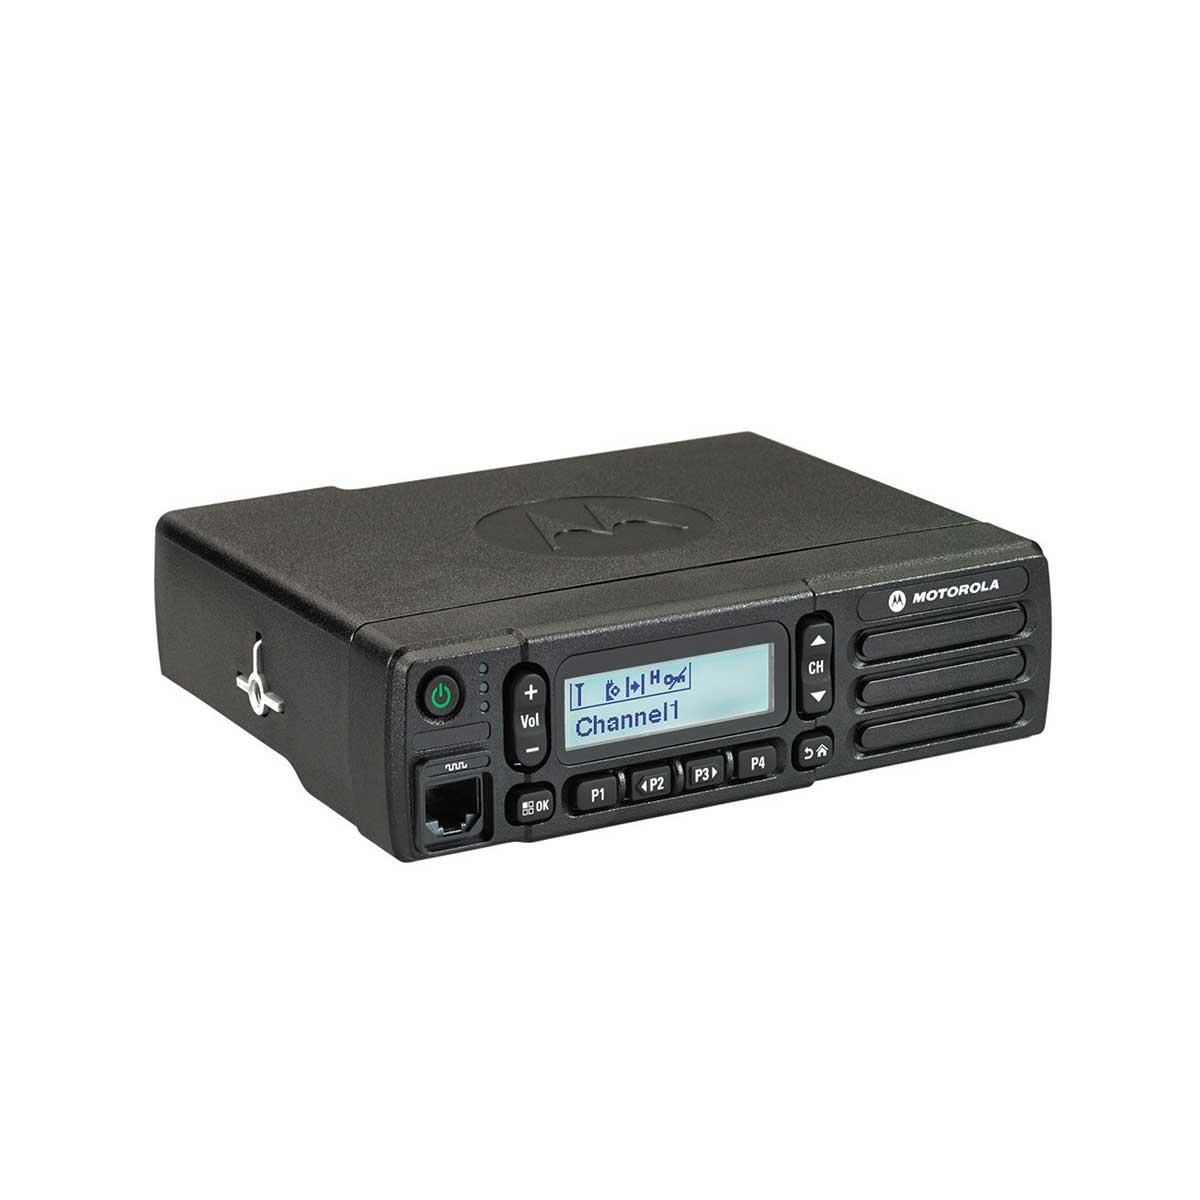 Radio Motorola DEM500 Digital LAM02JNH9JA1AN VHF 136-174 MHZ de 25W